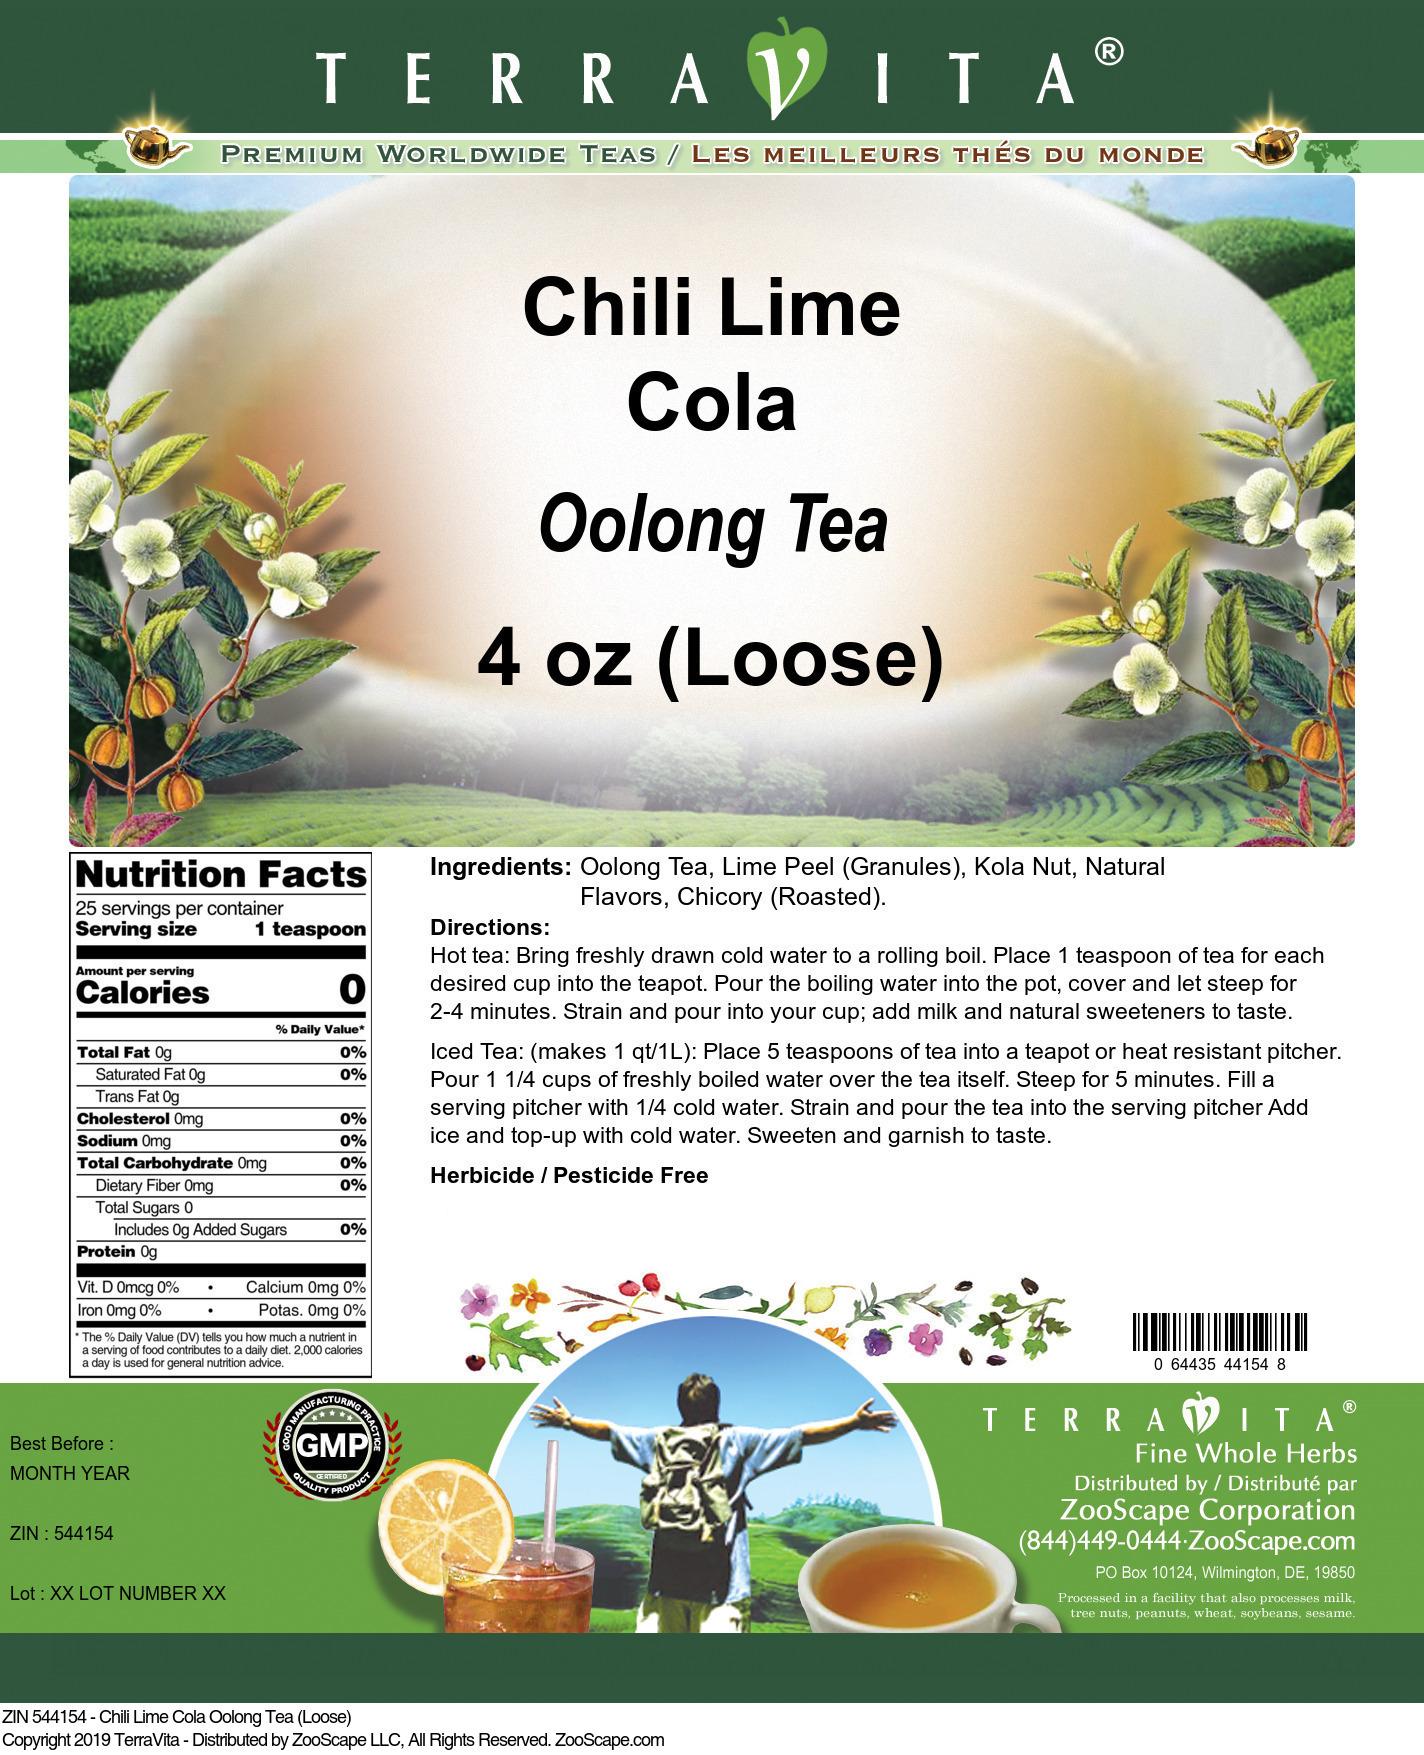 Chili Lime Cola Oolong Tea (Loose)